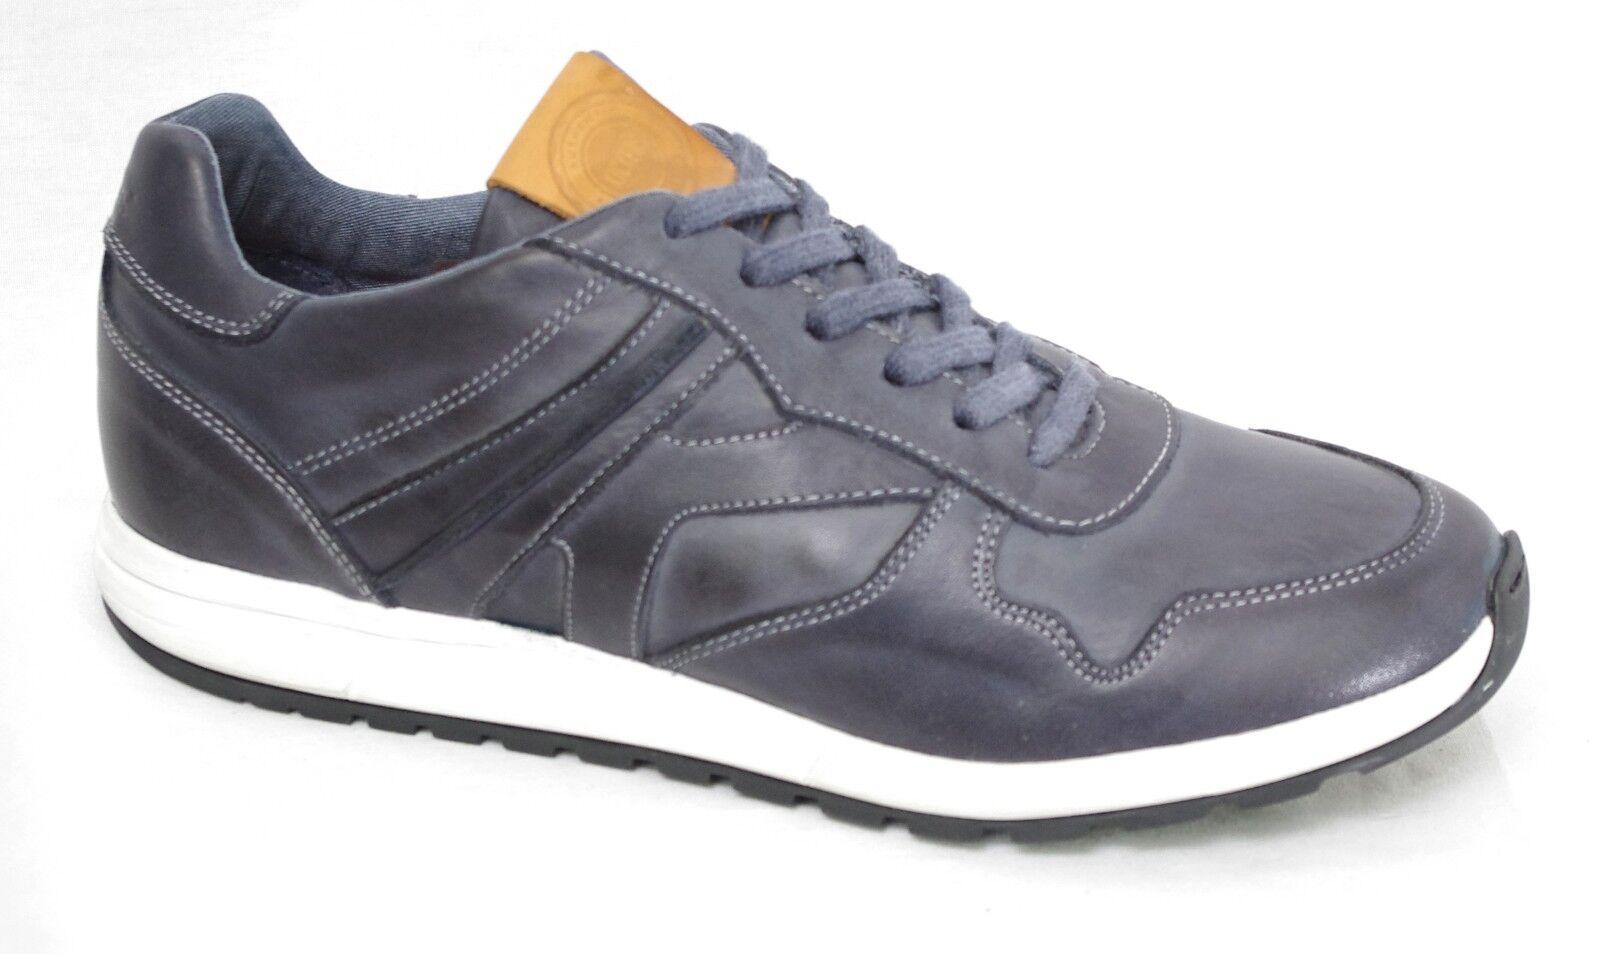 KICKERS NIELA shoes baskets cuir blue Marine homme 517480 - 10